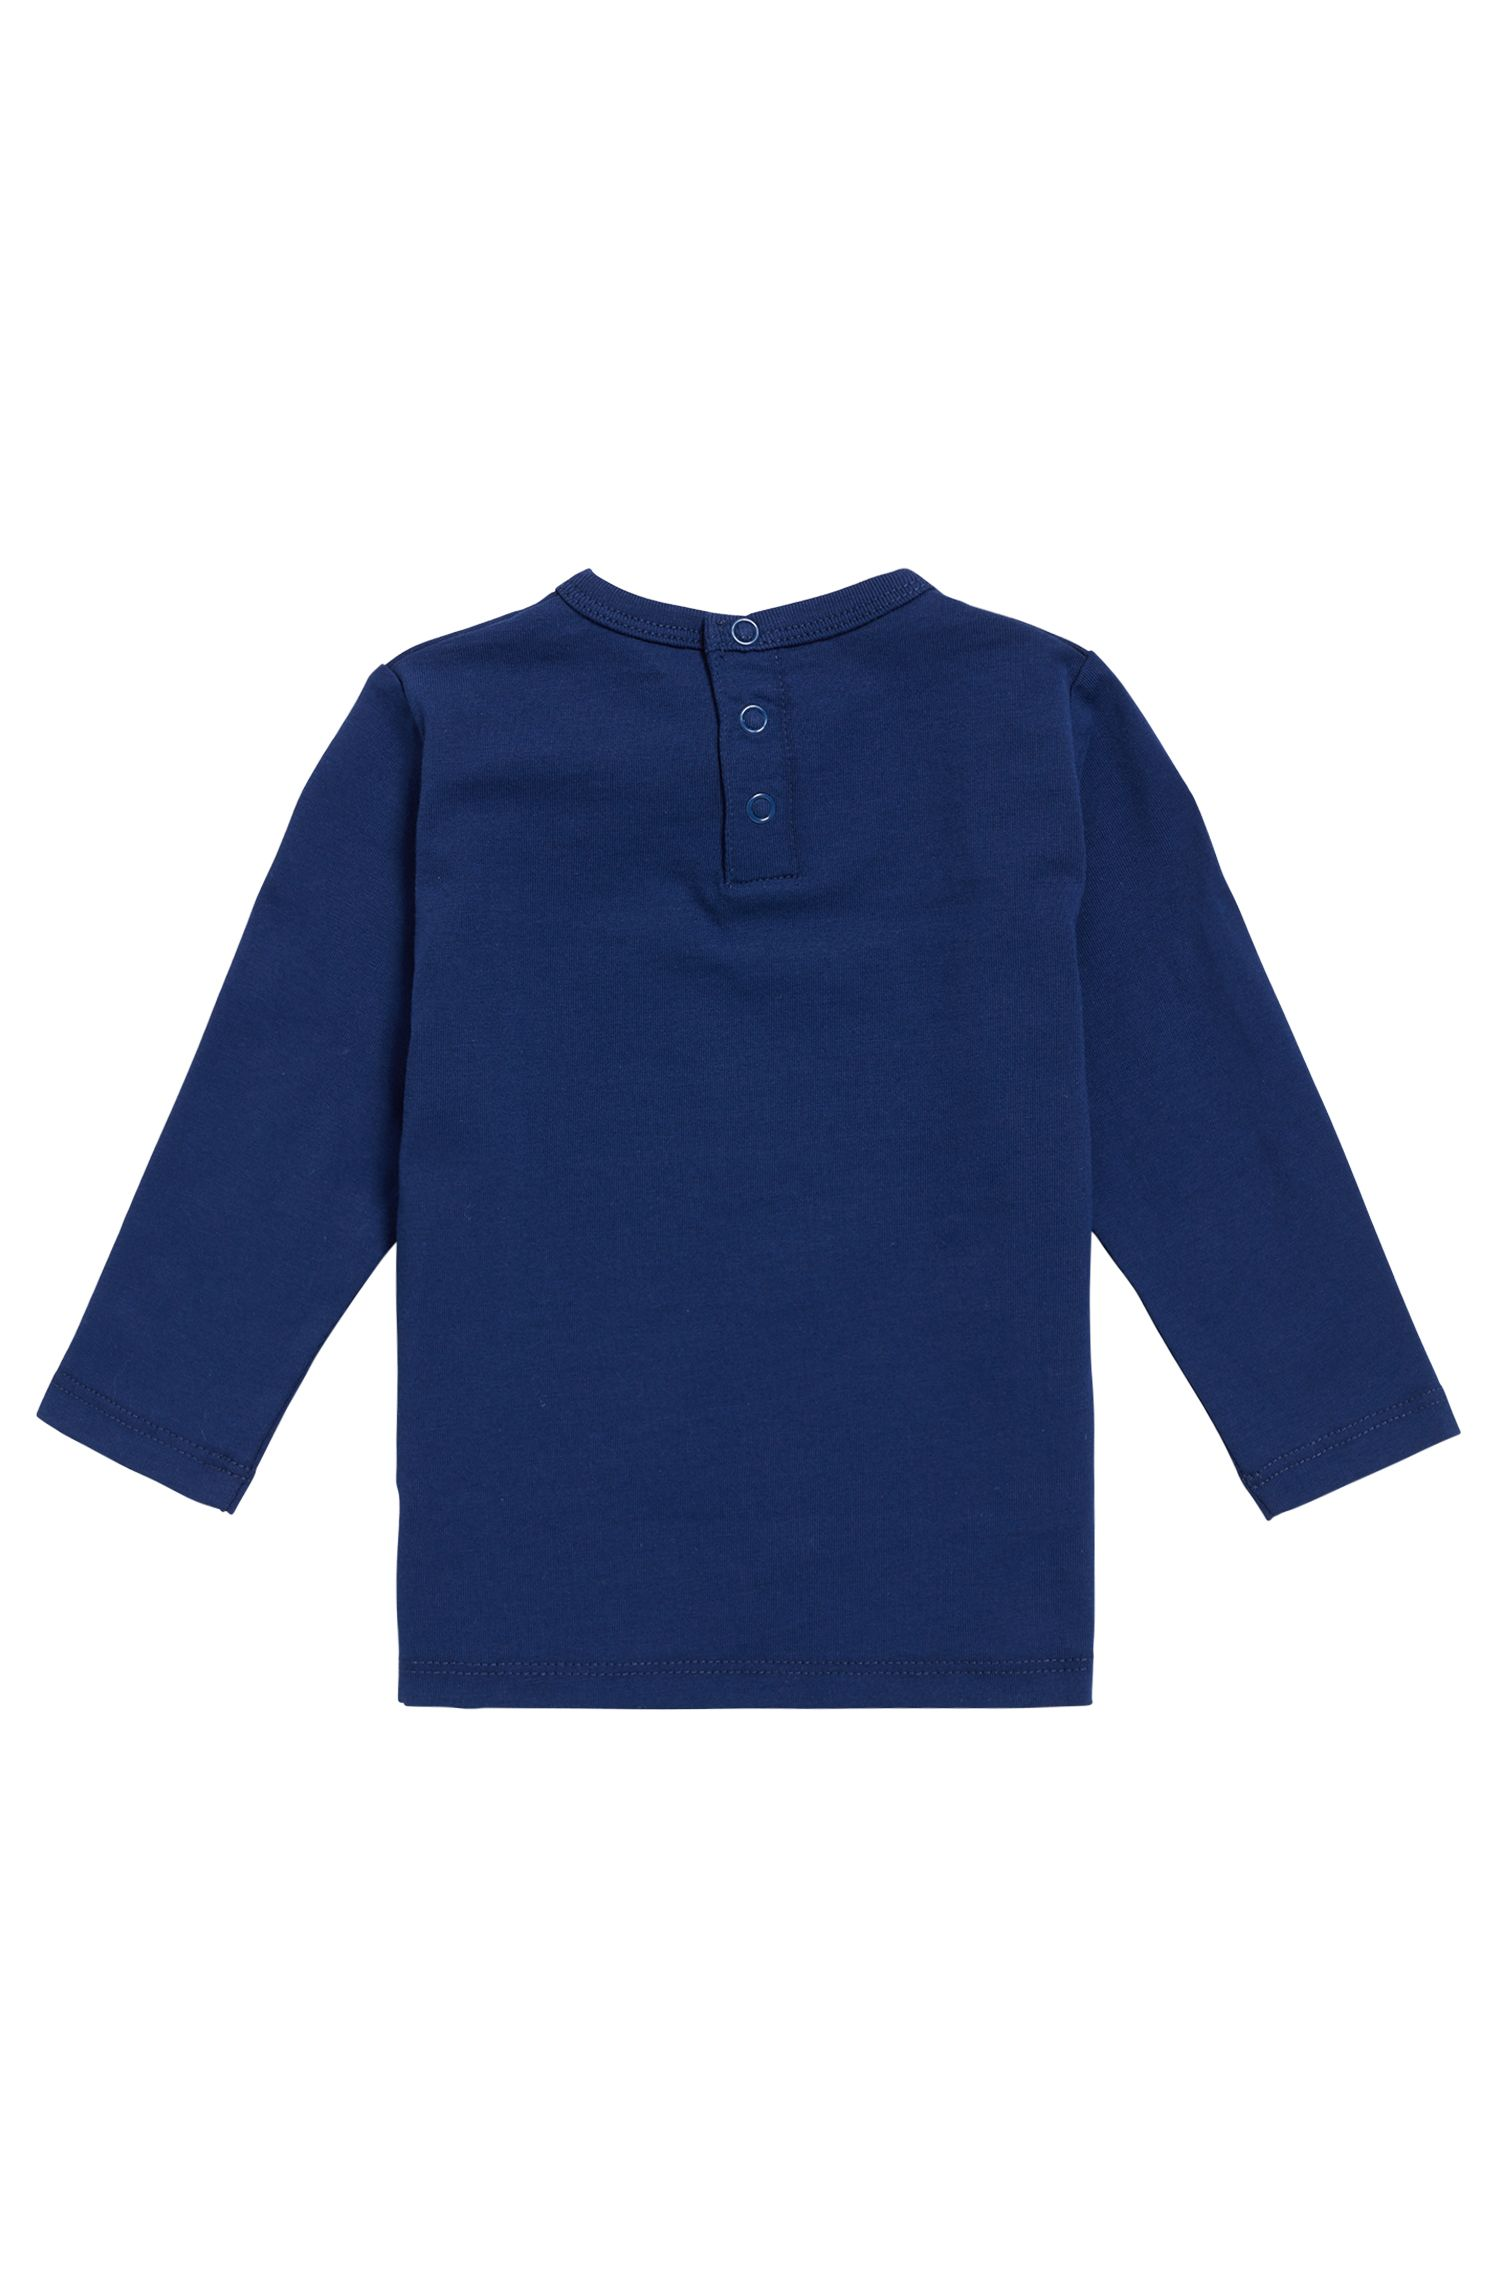 Camiseta de manga larga en algodón con logo para niños